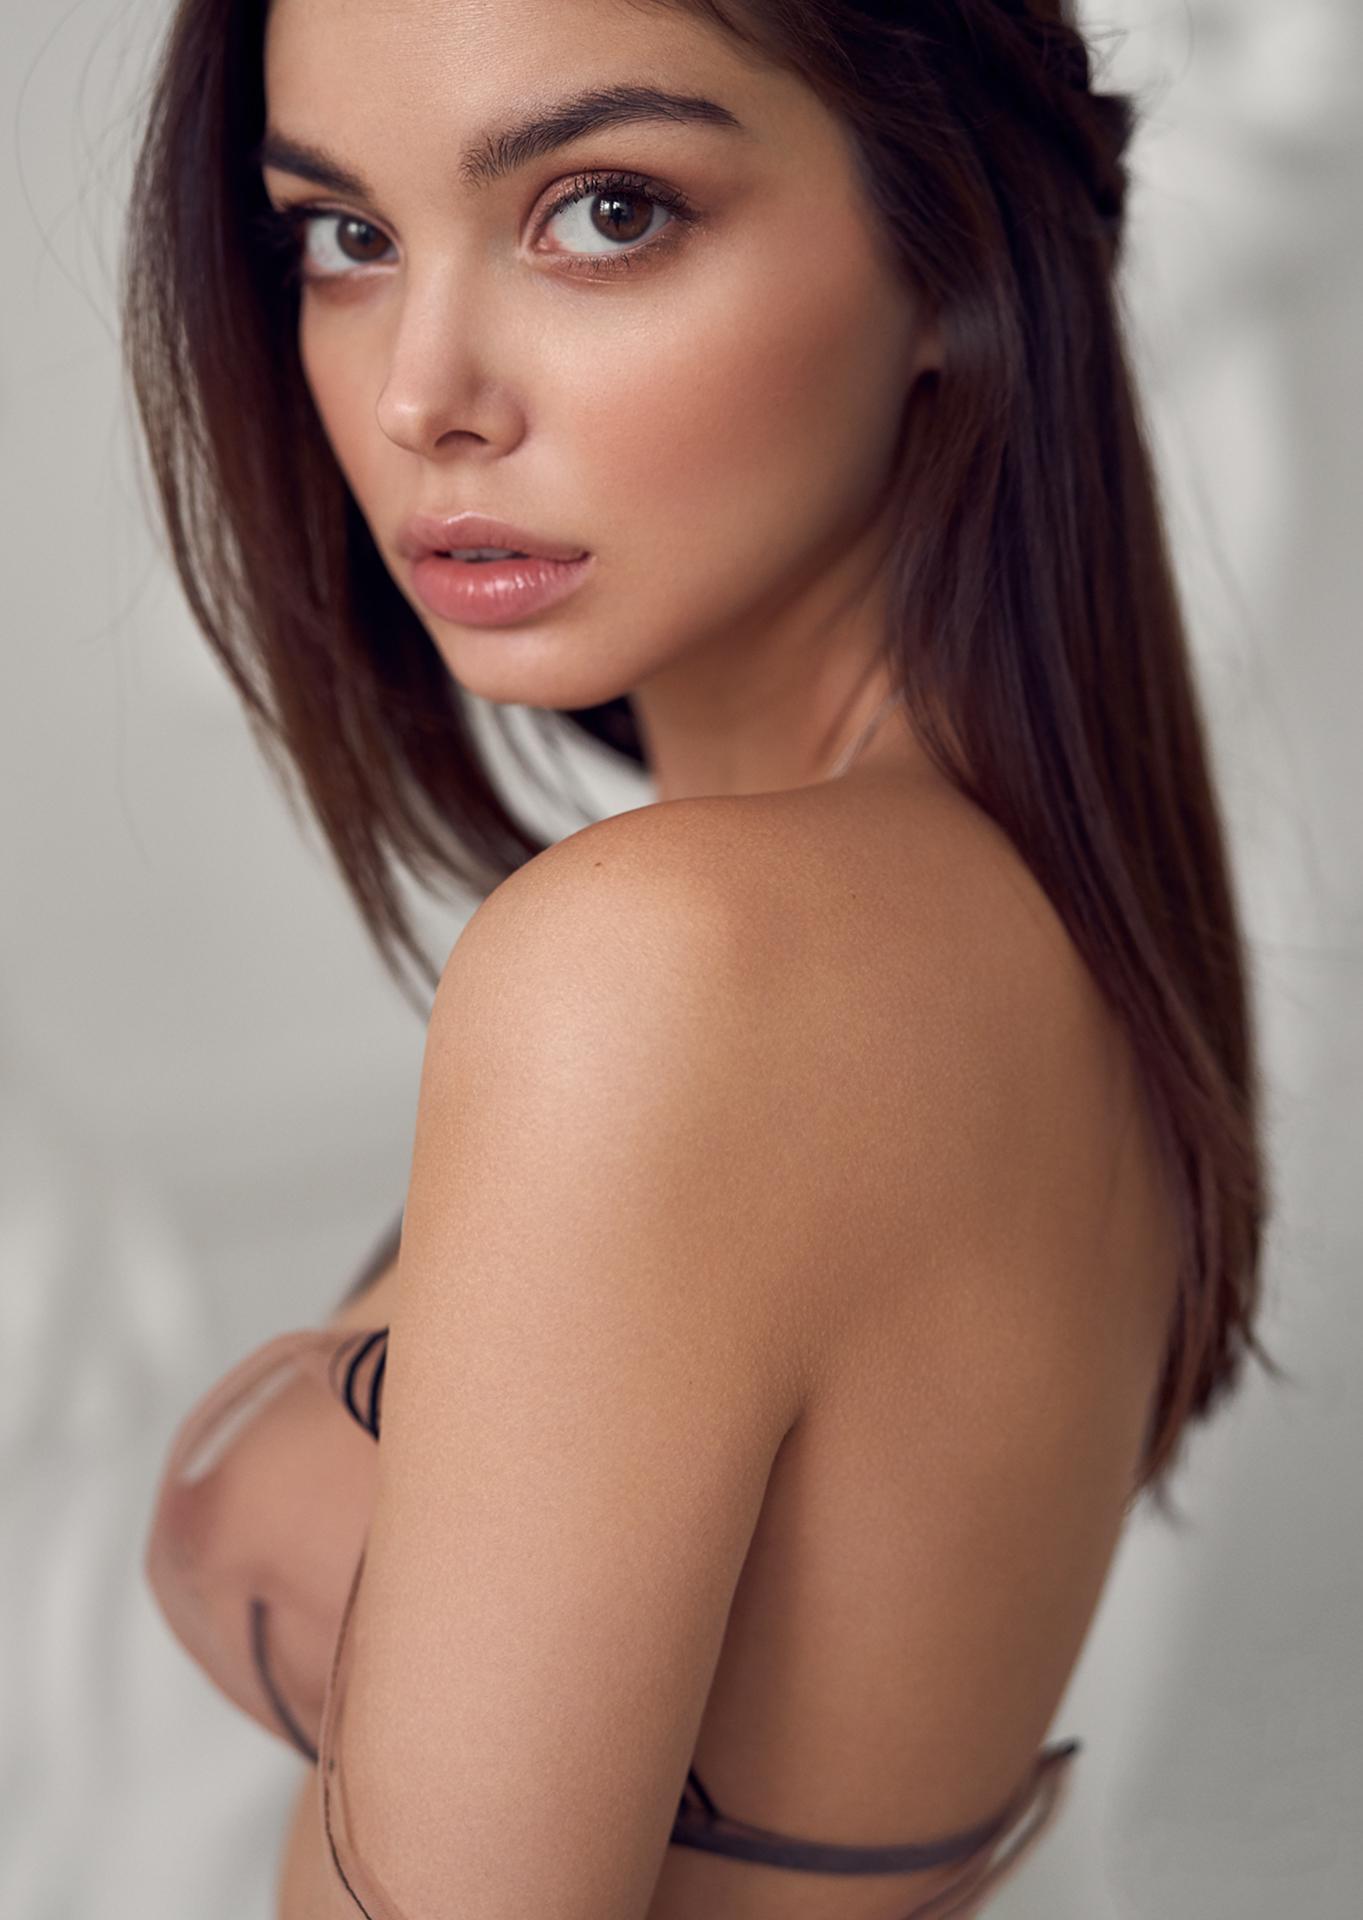 Roman-Filippov-photographer-5986052